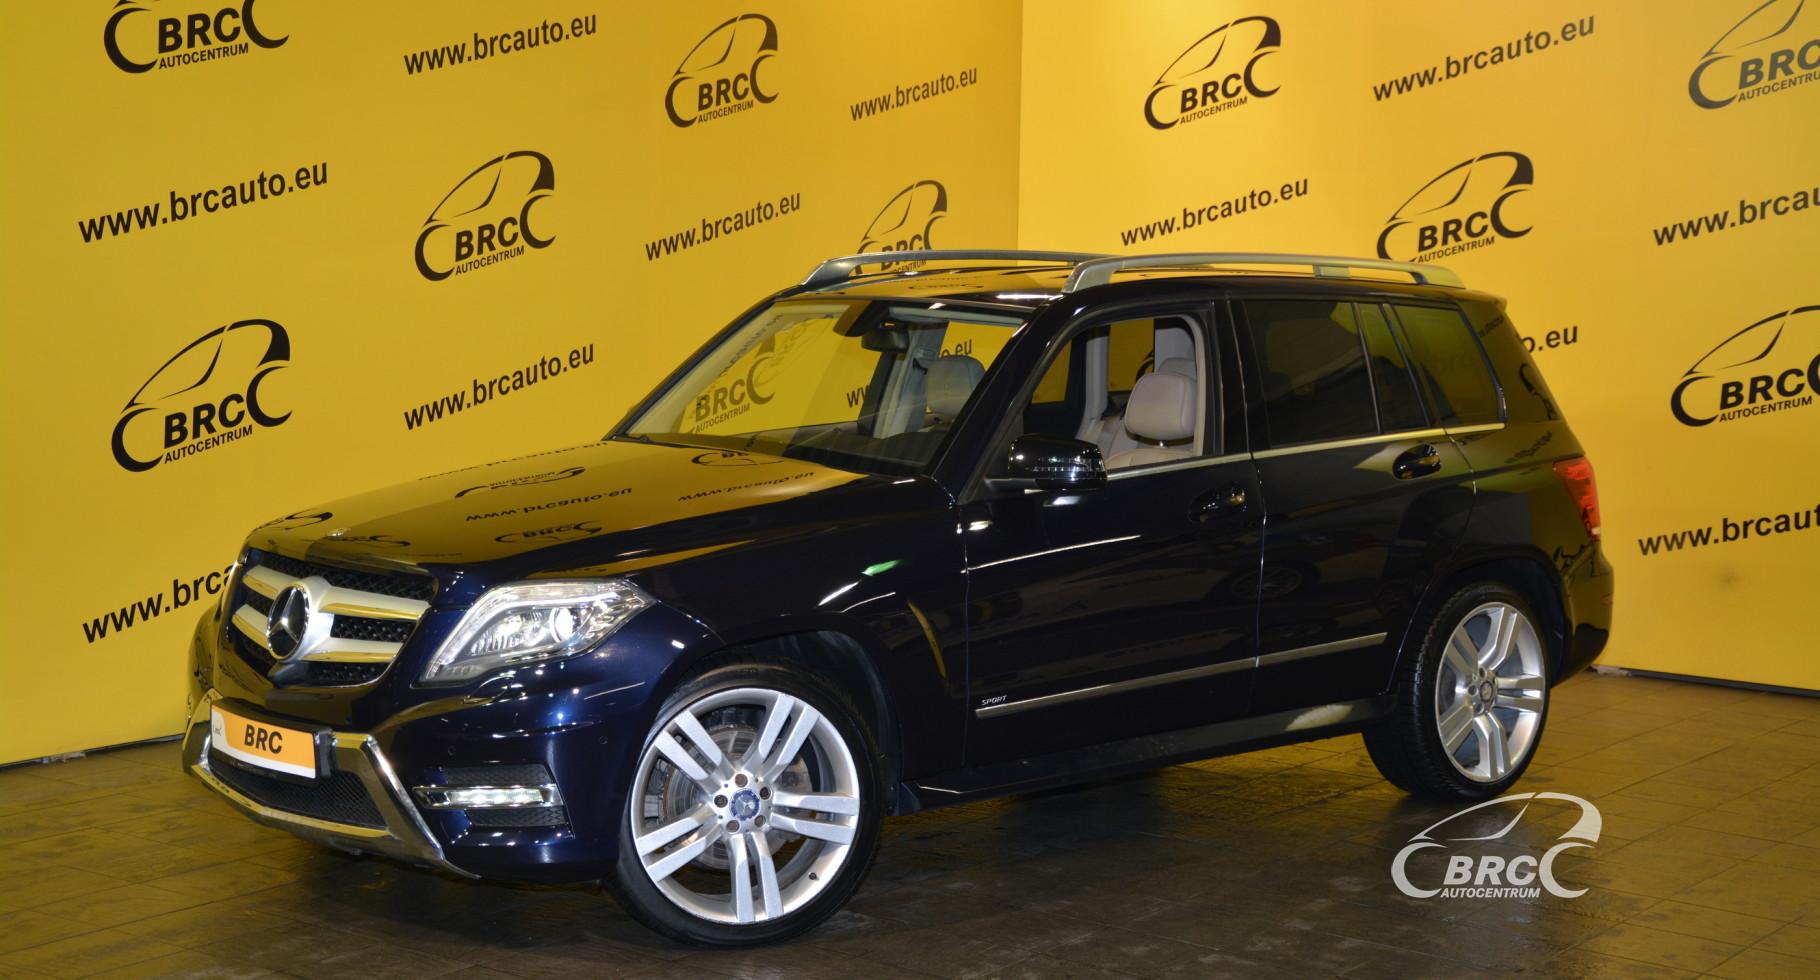 All Types glk amg : Mercedes-Benz GLK 320 CDI 4Matic AMG pack Automatas (ID: 798763 ...